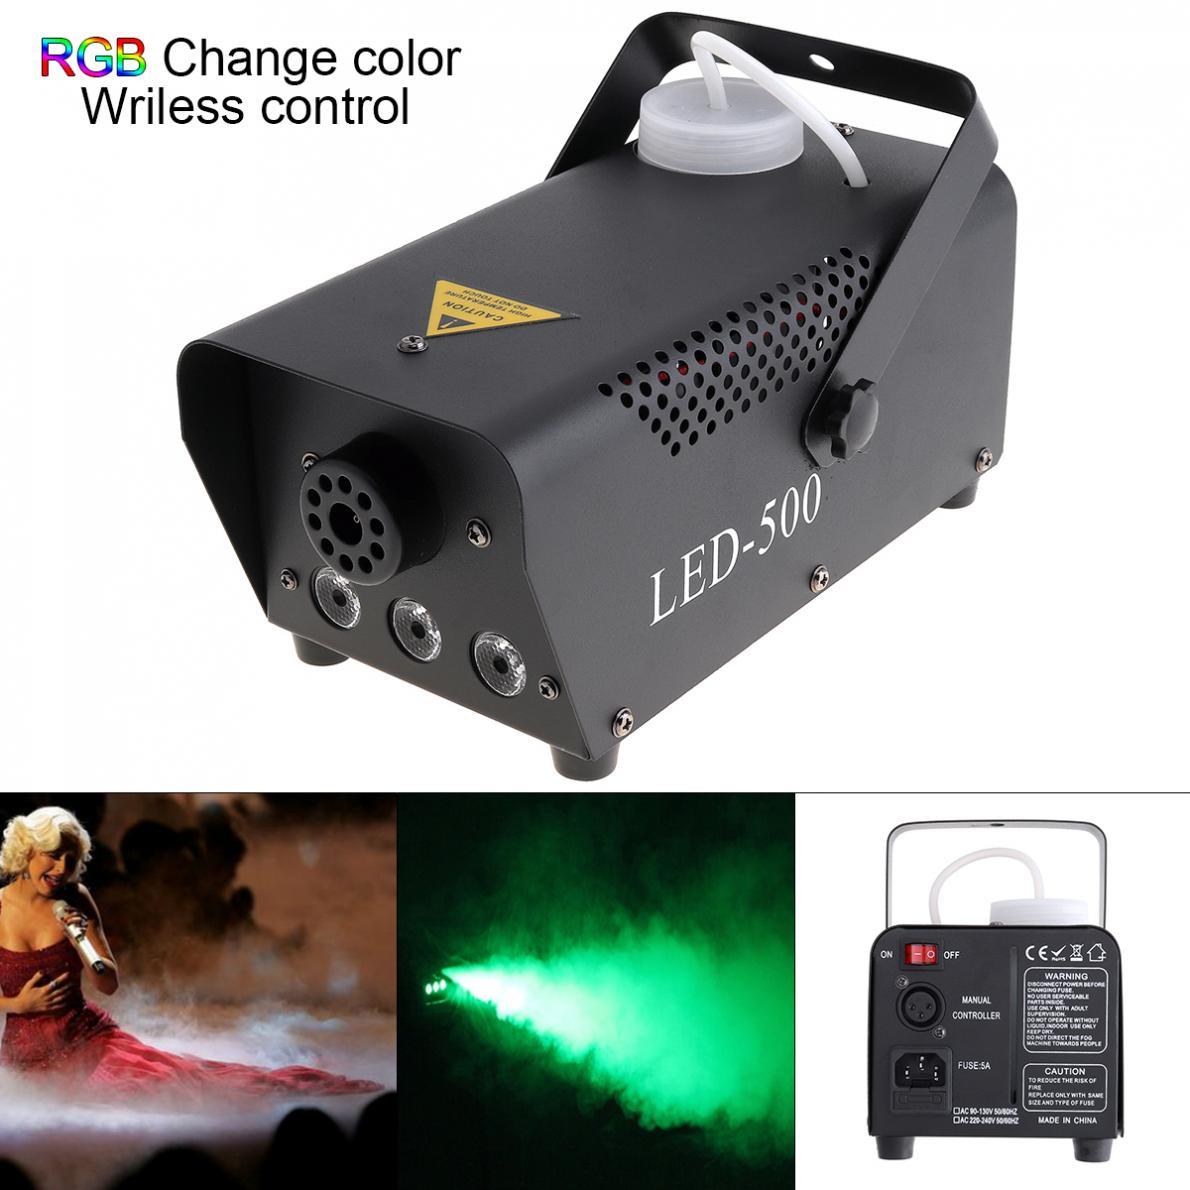 Wireless Control LED 500W Smoke Machine RGB Color LED Fog Machine Professional LED Fogger Stage Smoke